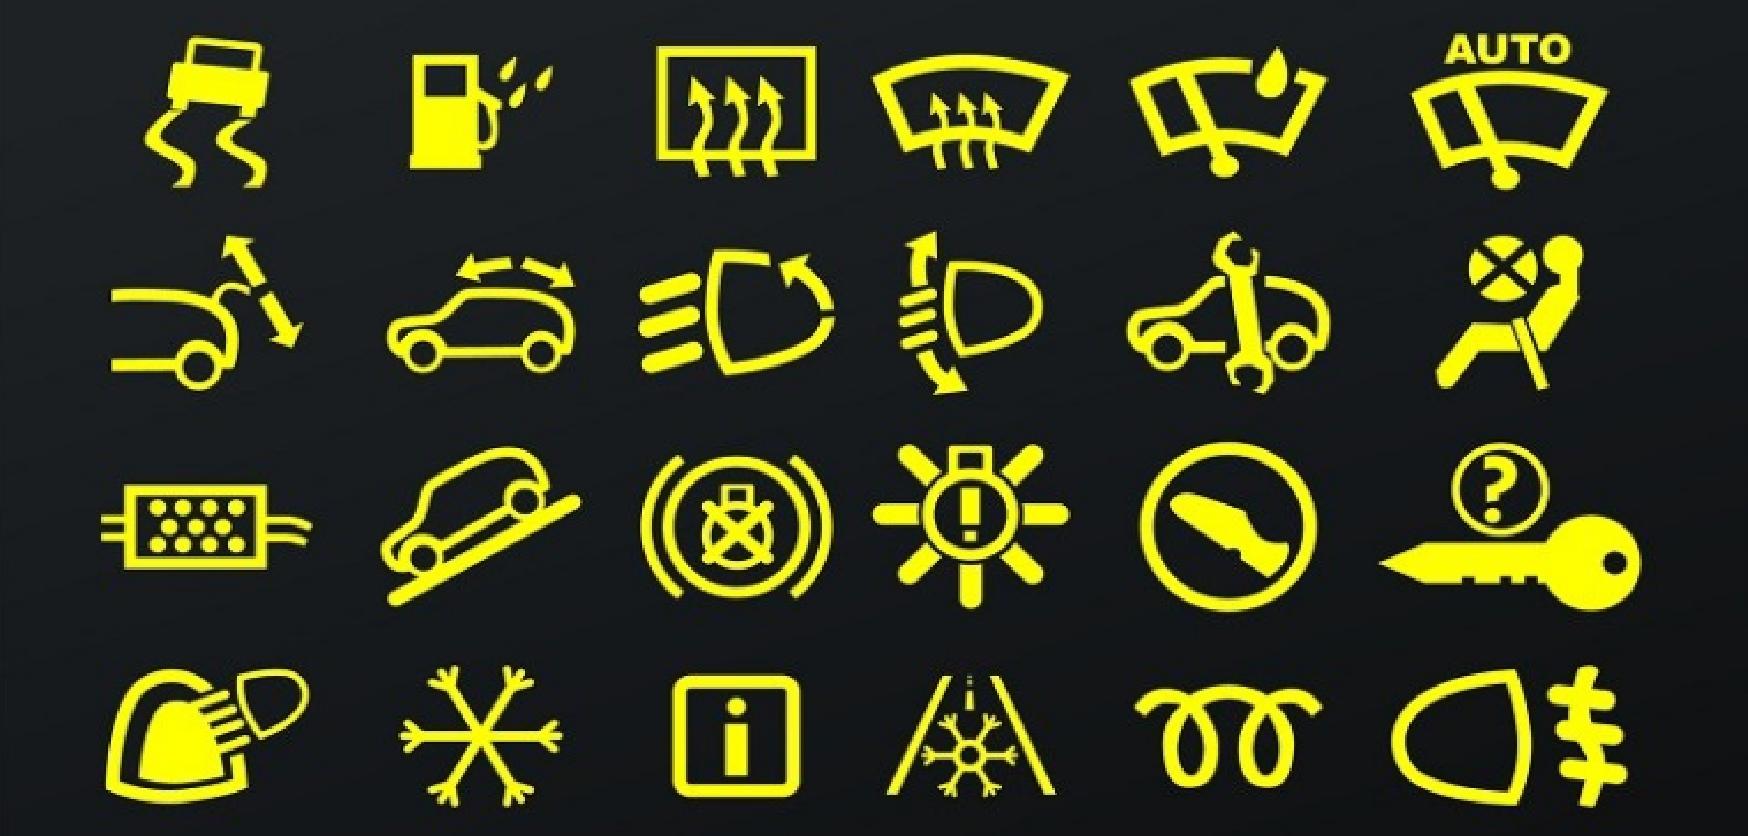 Значки на приборной панели автомобиля